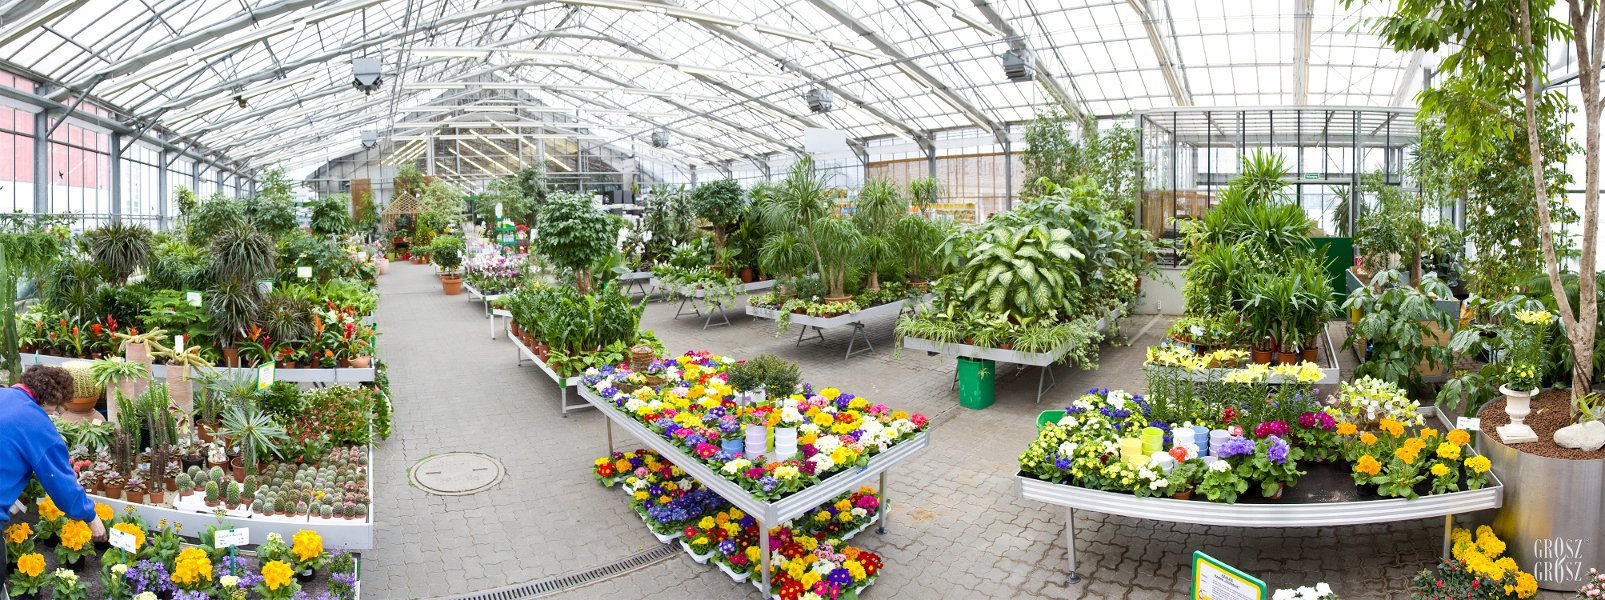 Starkl Gartencenter In V Sendorf Blumen G Rtnerei Gesch Fte Handel